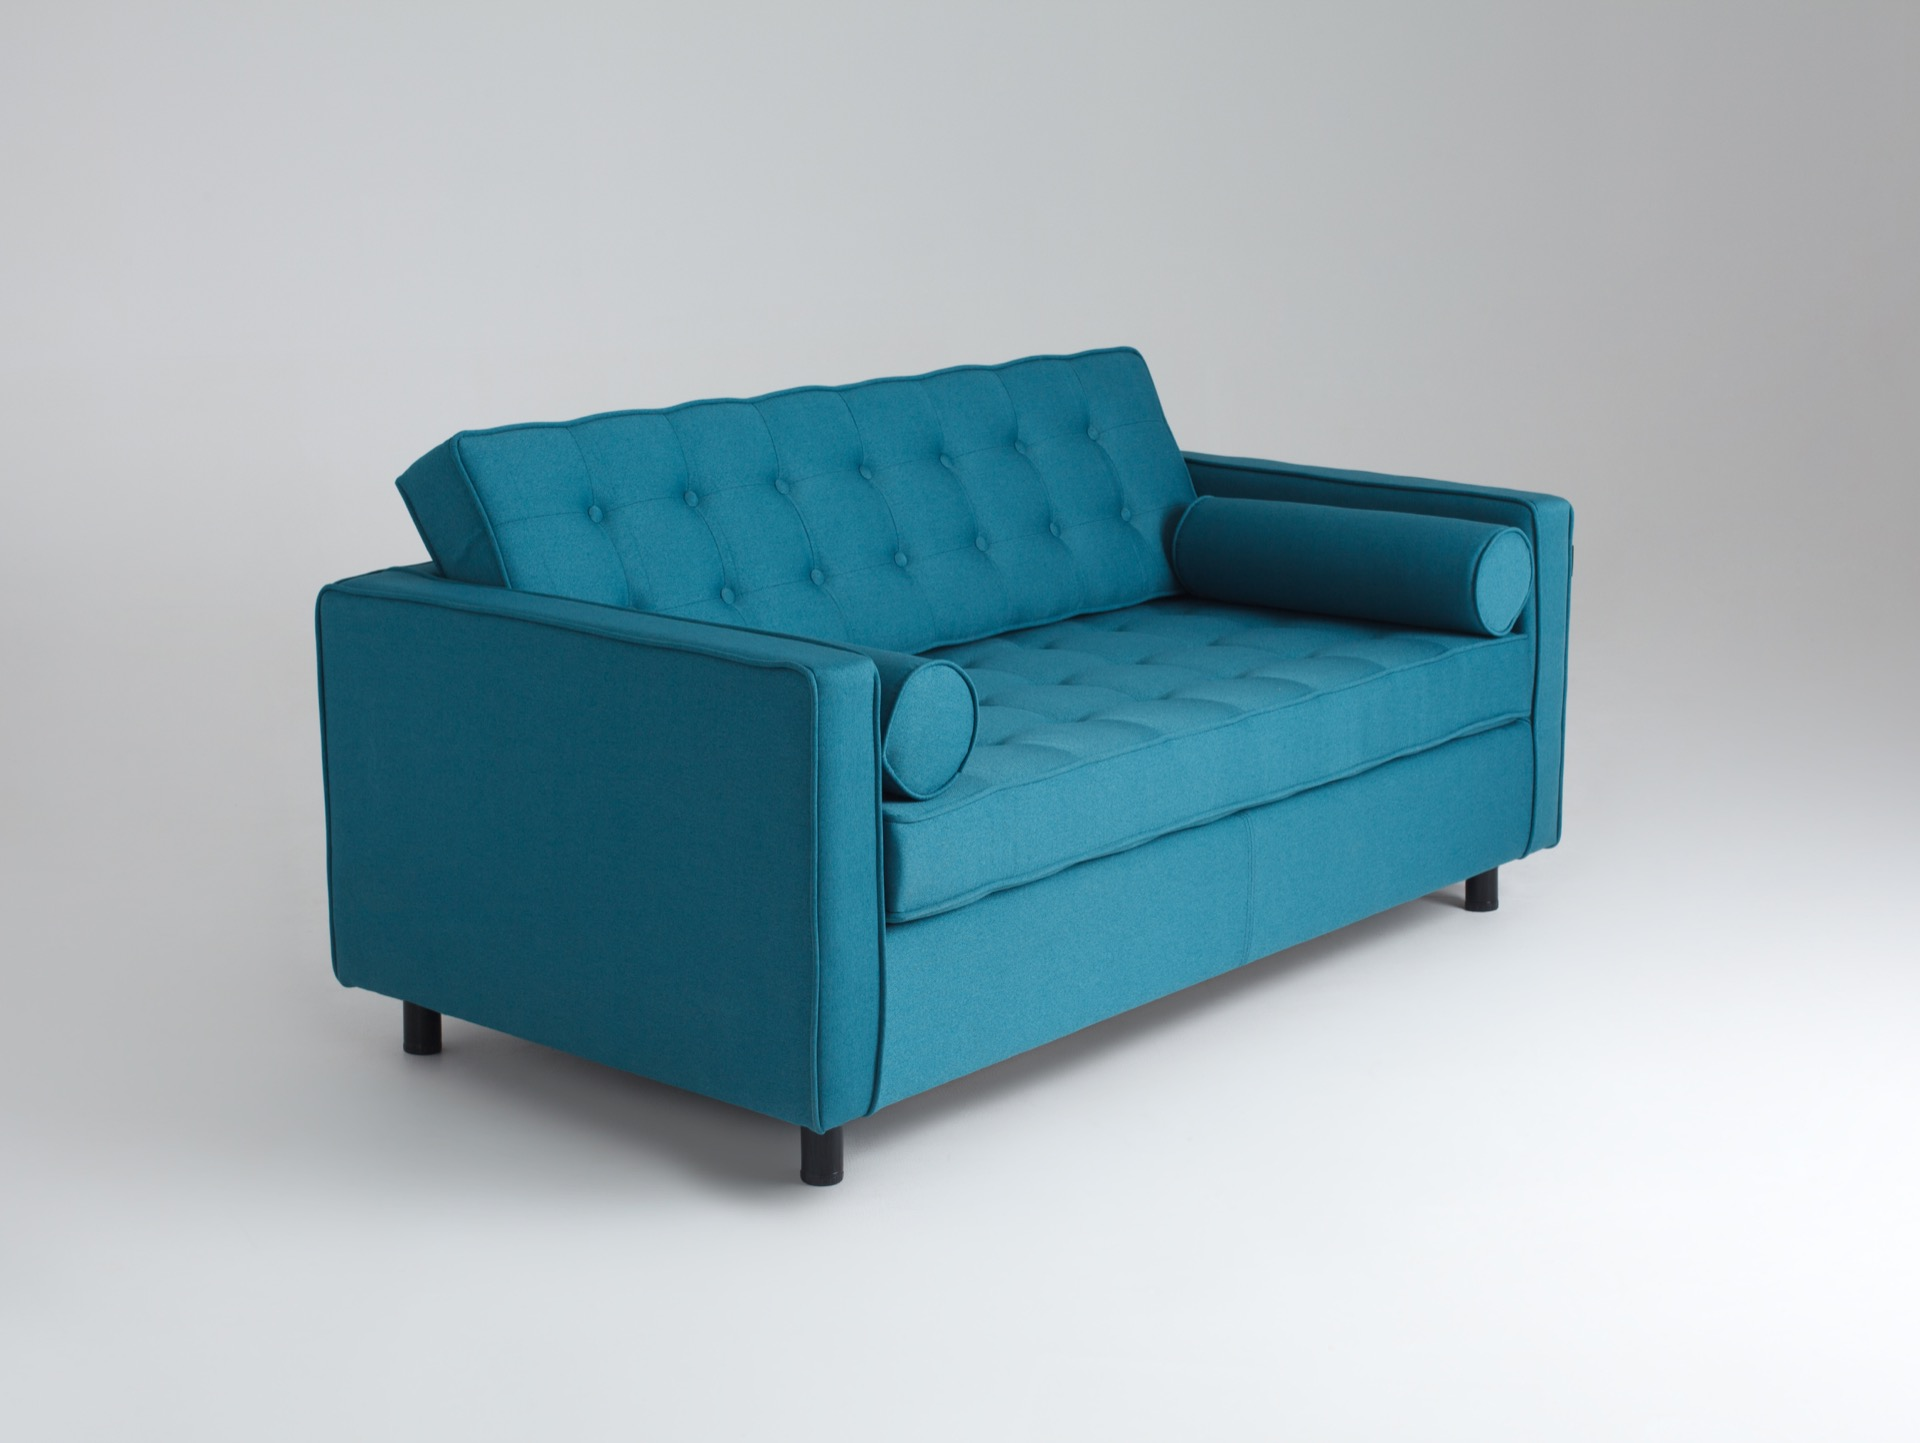 2-Sitzer Sofa TOPIC